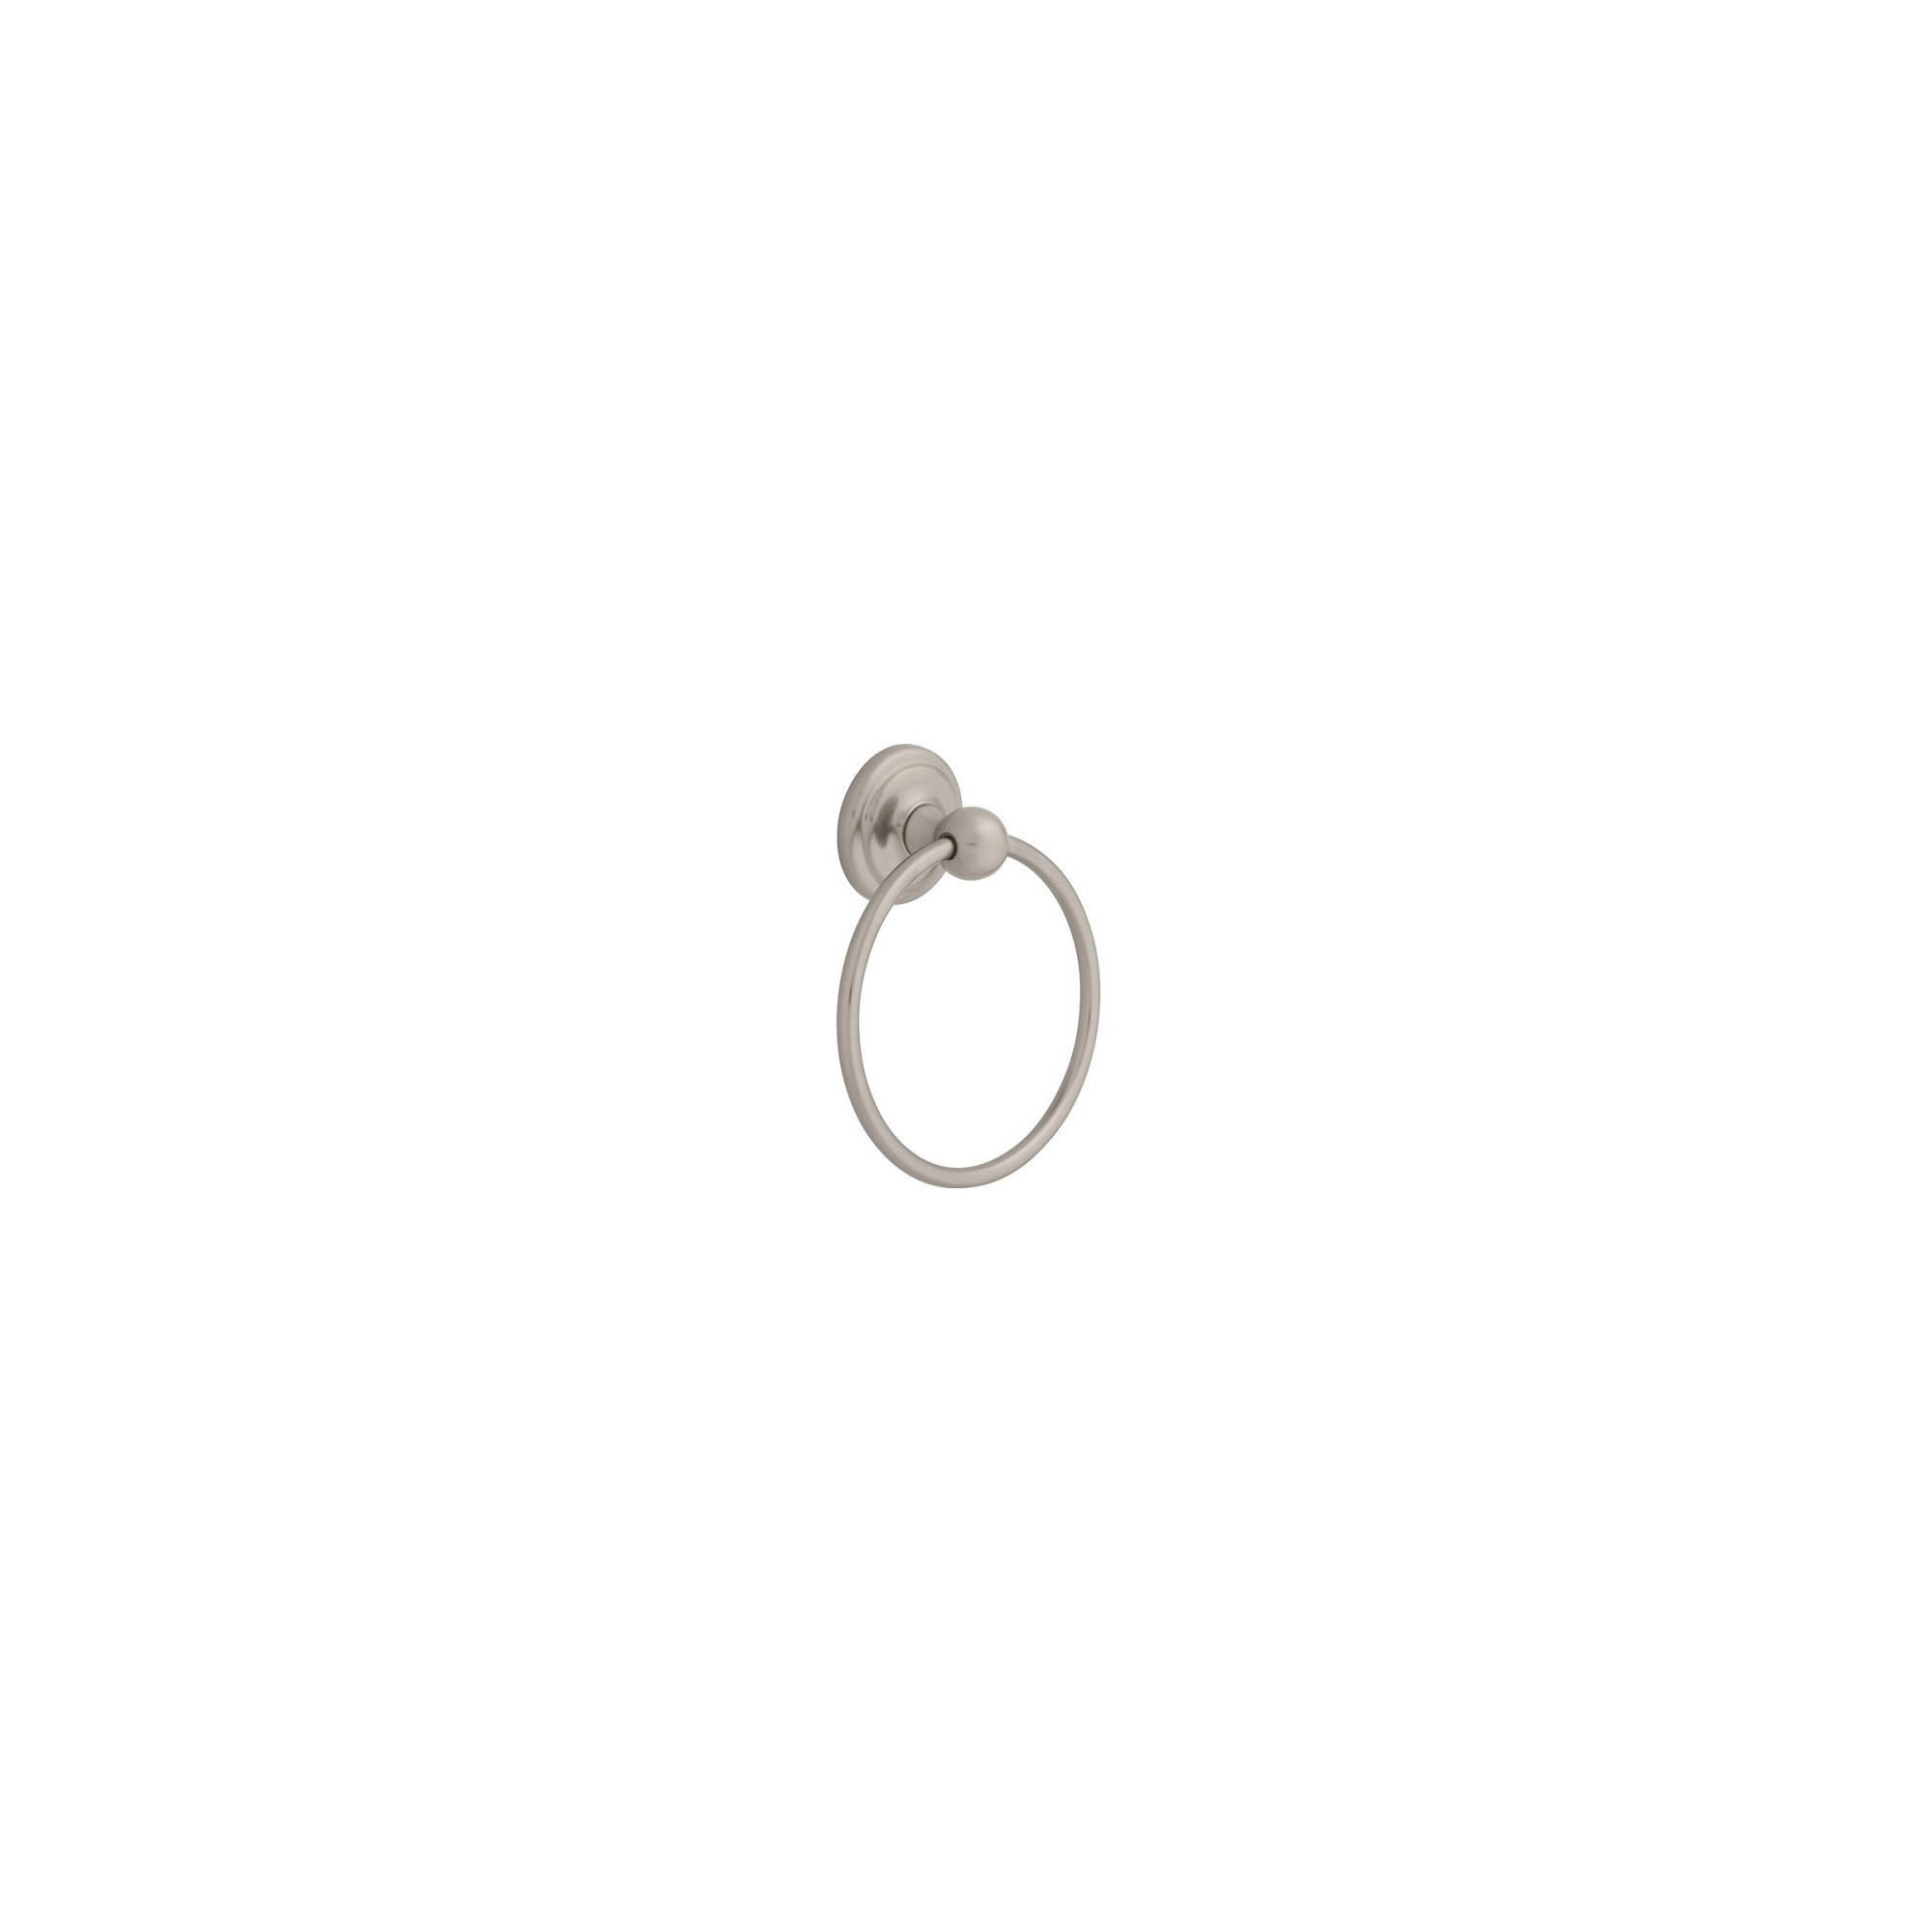 Jamestown Towel Ring Satin Nickel - Liberty, Gray